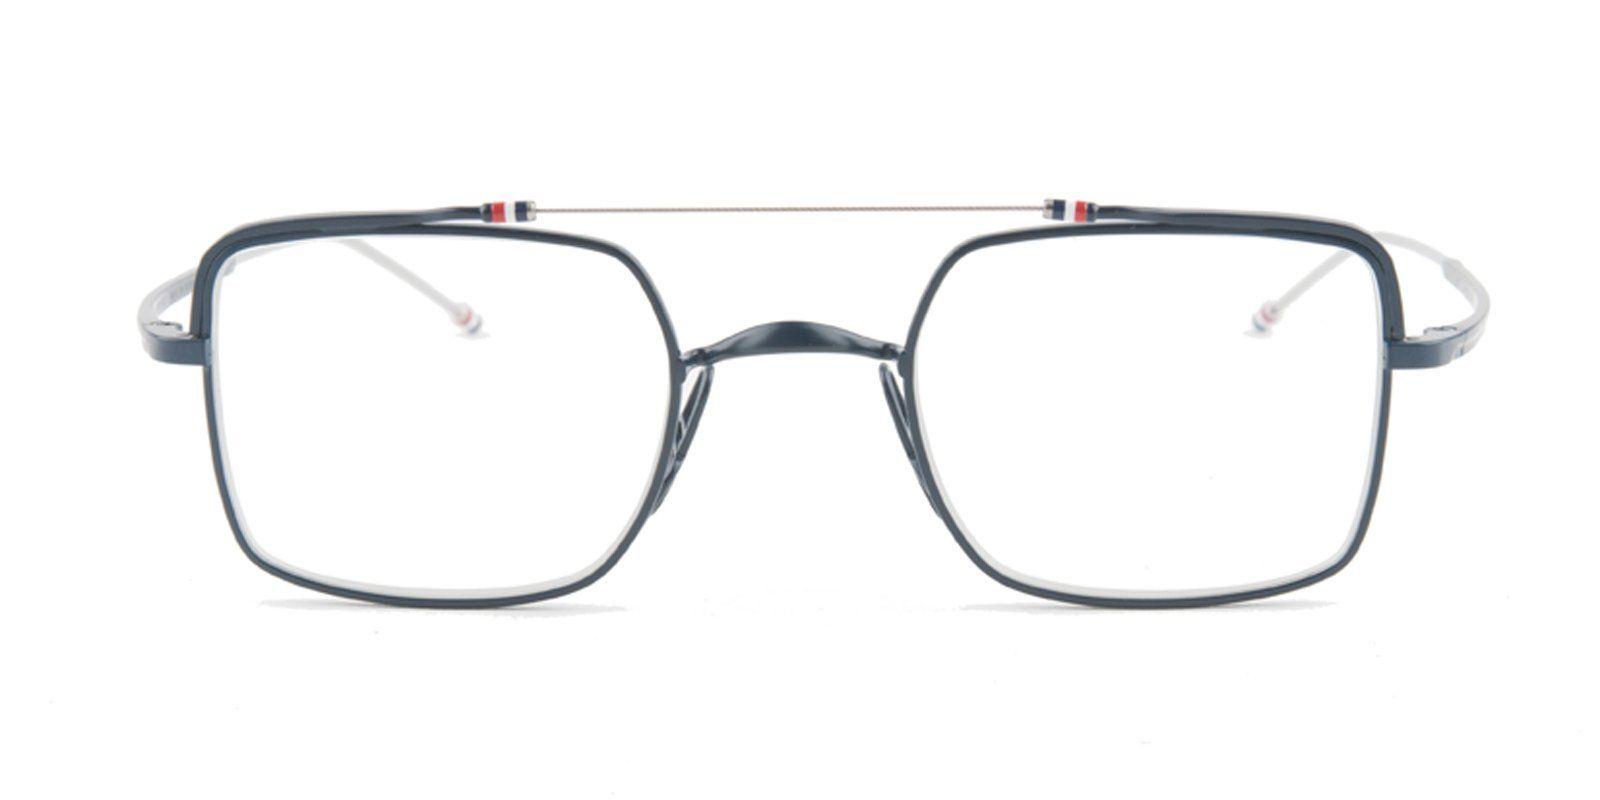 977cbfc5038d Thom Browne - TB909 Blue-eyeglasses-Designer Eyes Thom Browne Sunglasses